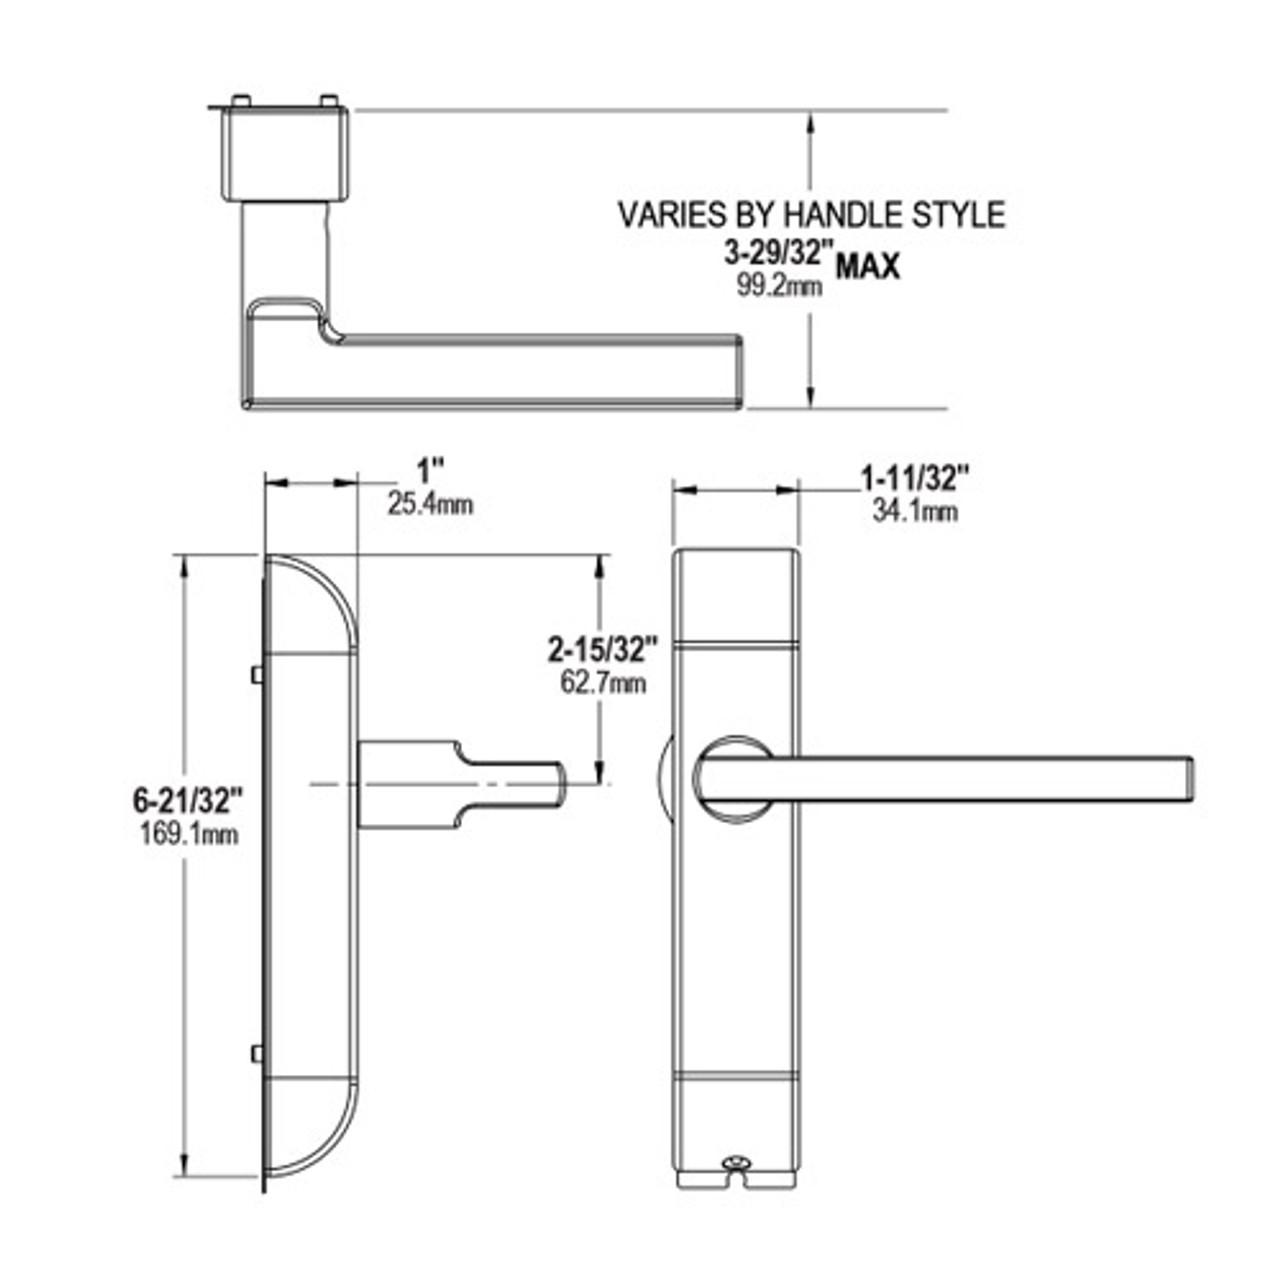 4600-MV-521-US32D Adams Rite MV Designer handle Dimensional View